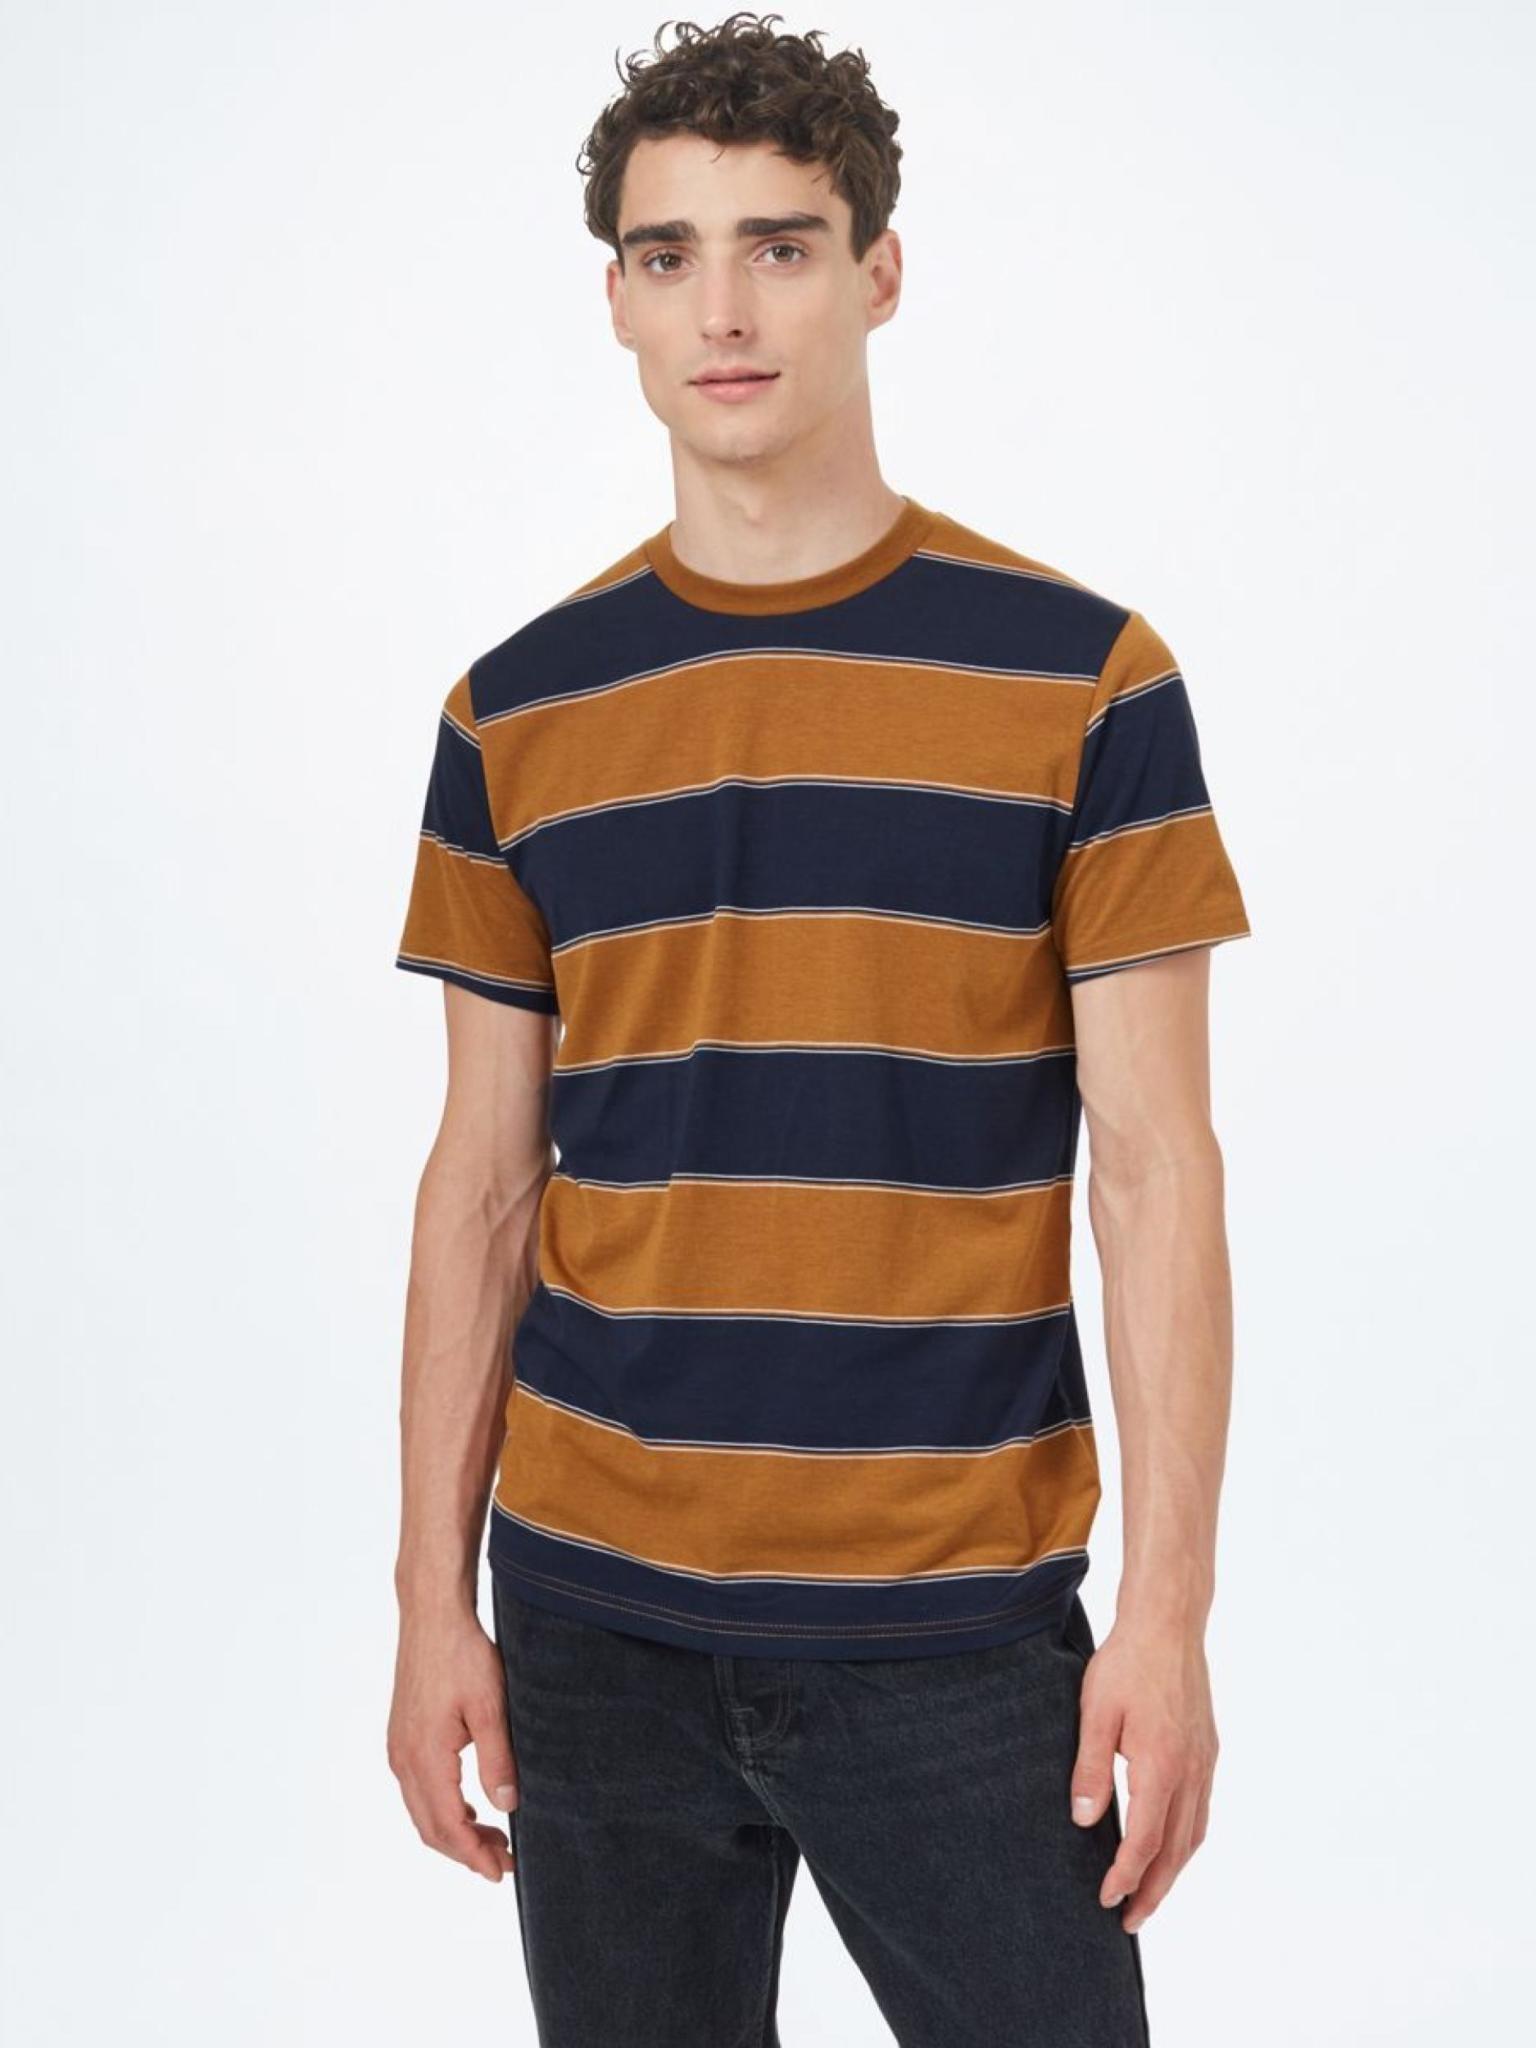 Tentree Men's Rugby Stripe T-Shirt